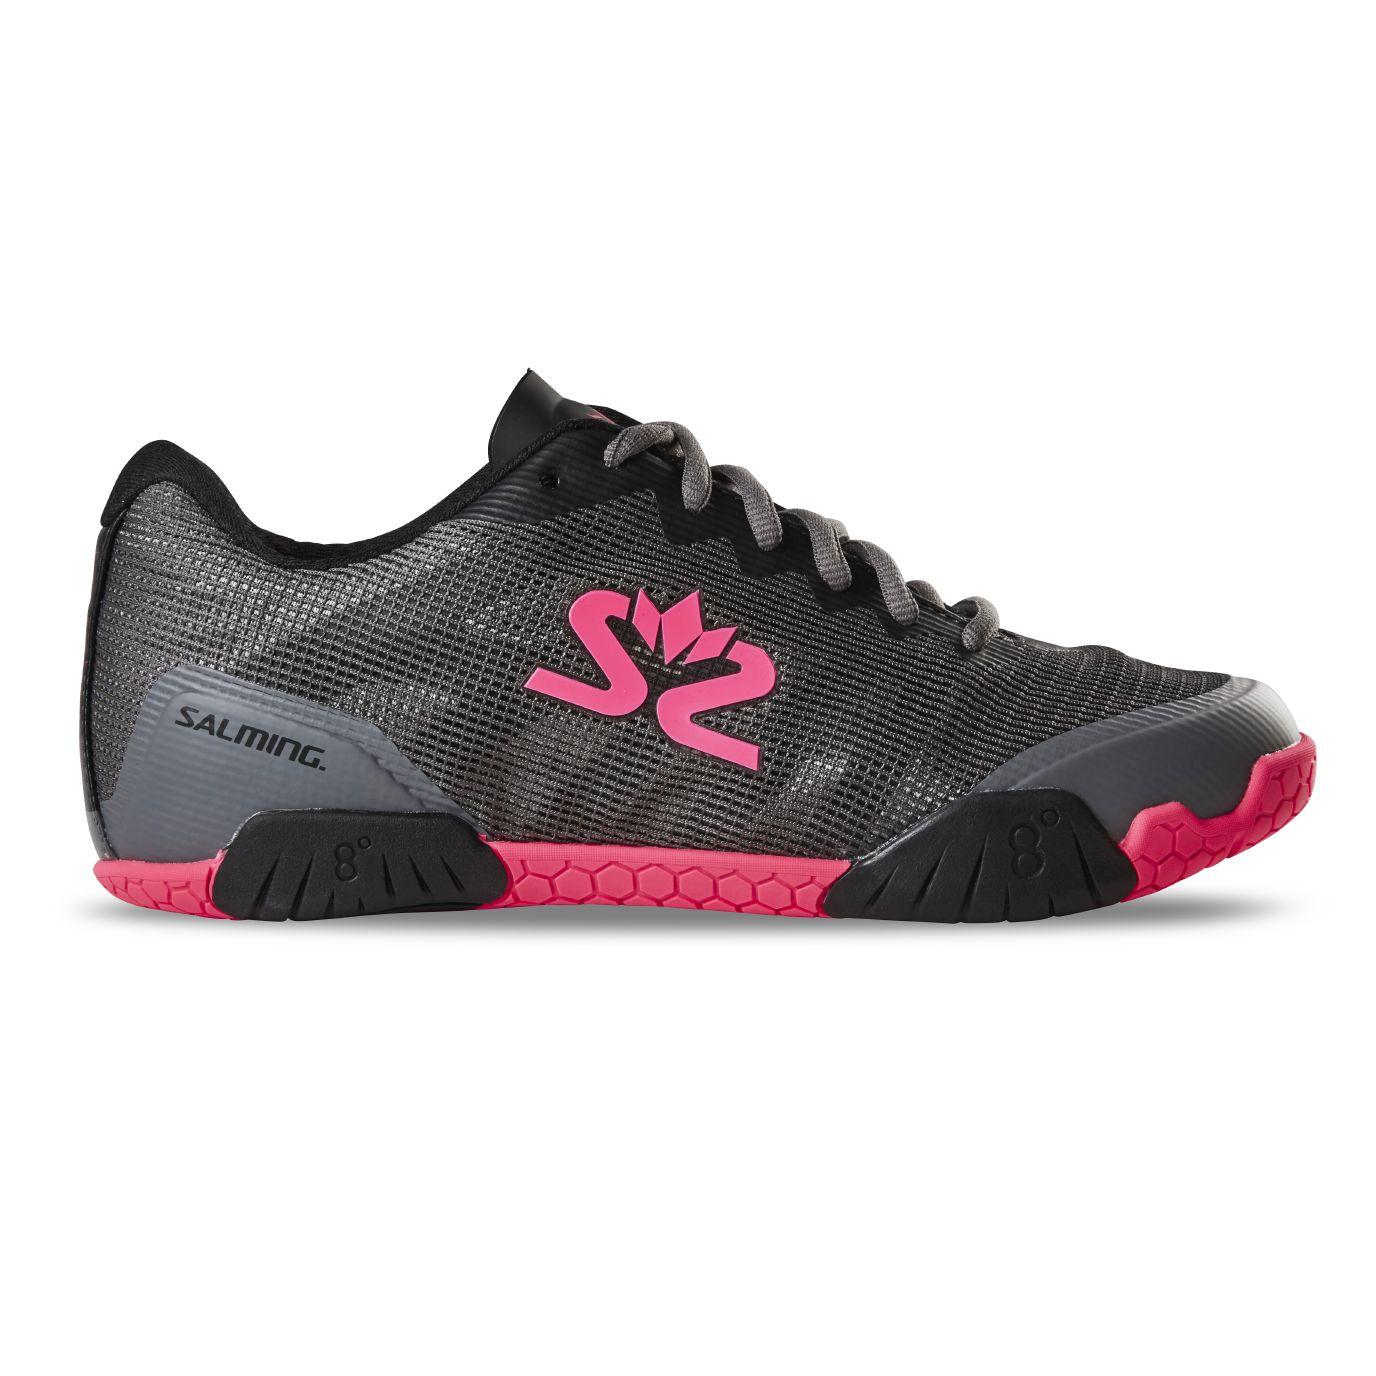 Salming Hawk Shoe Women GunMetal/Pink 5,5 UK - 38 2/3 EUR - 24,5 cm